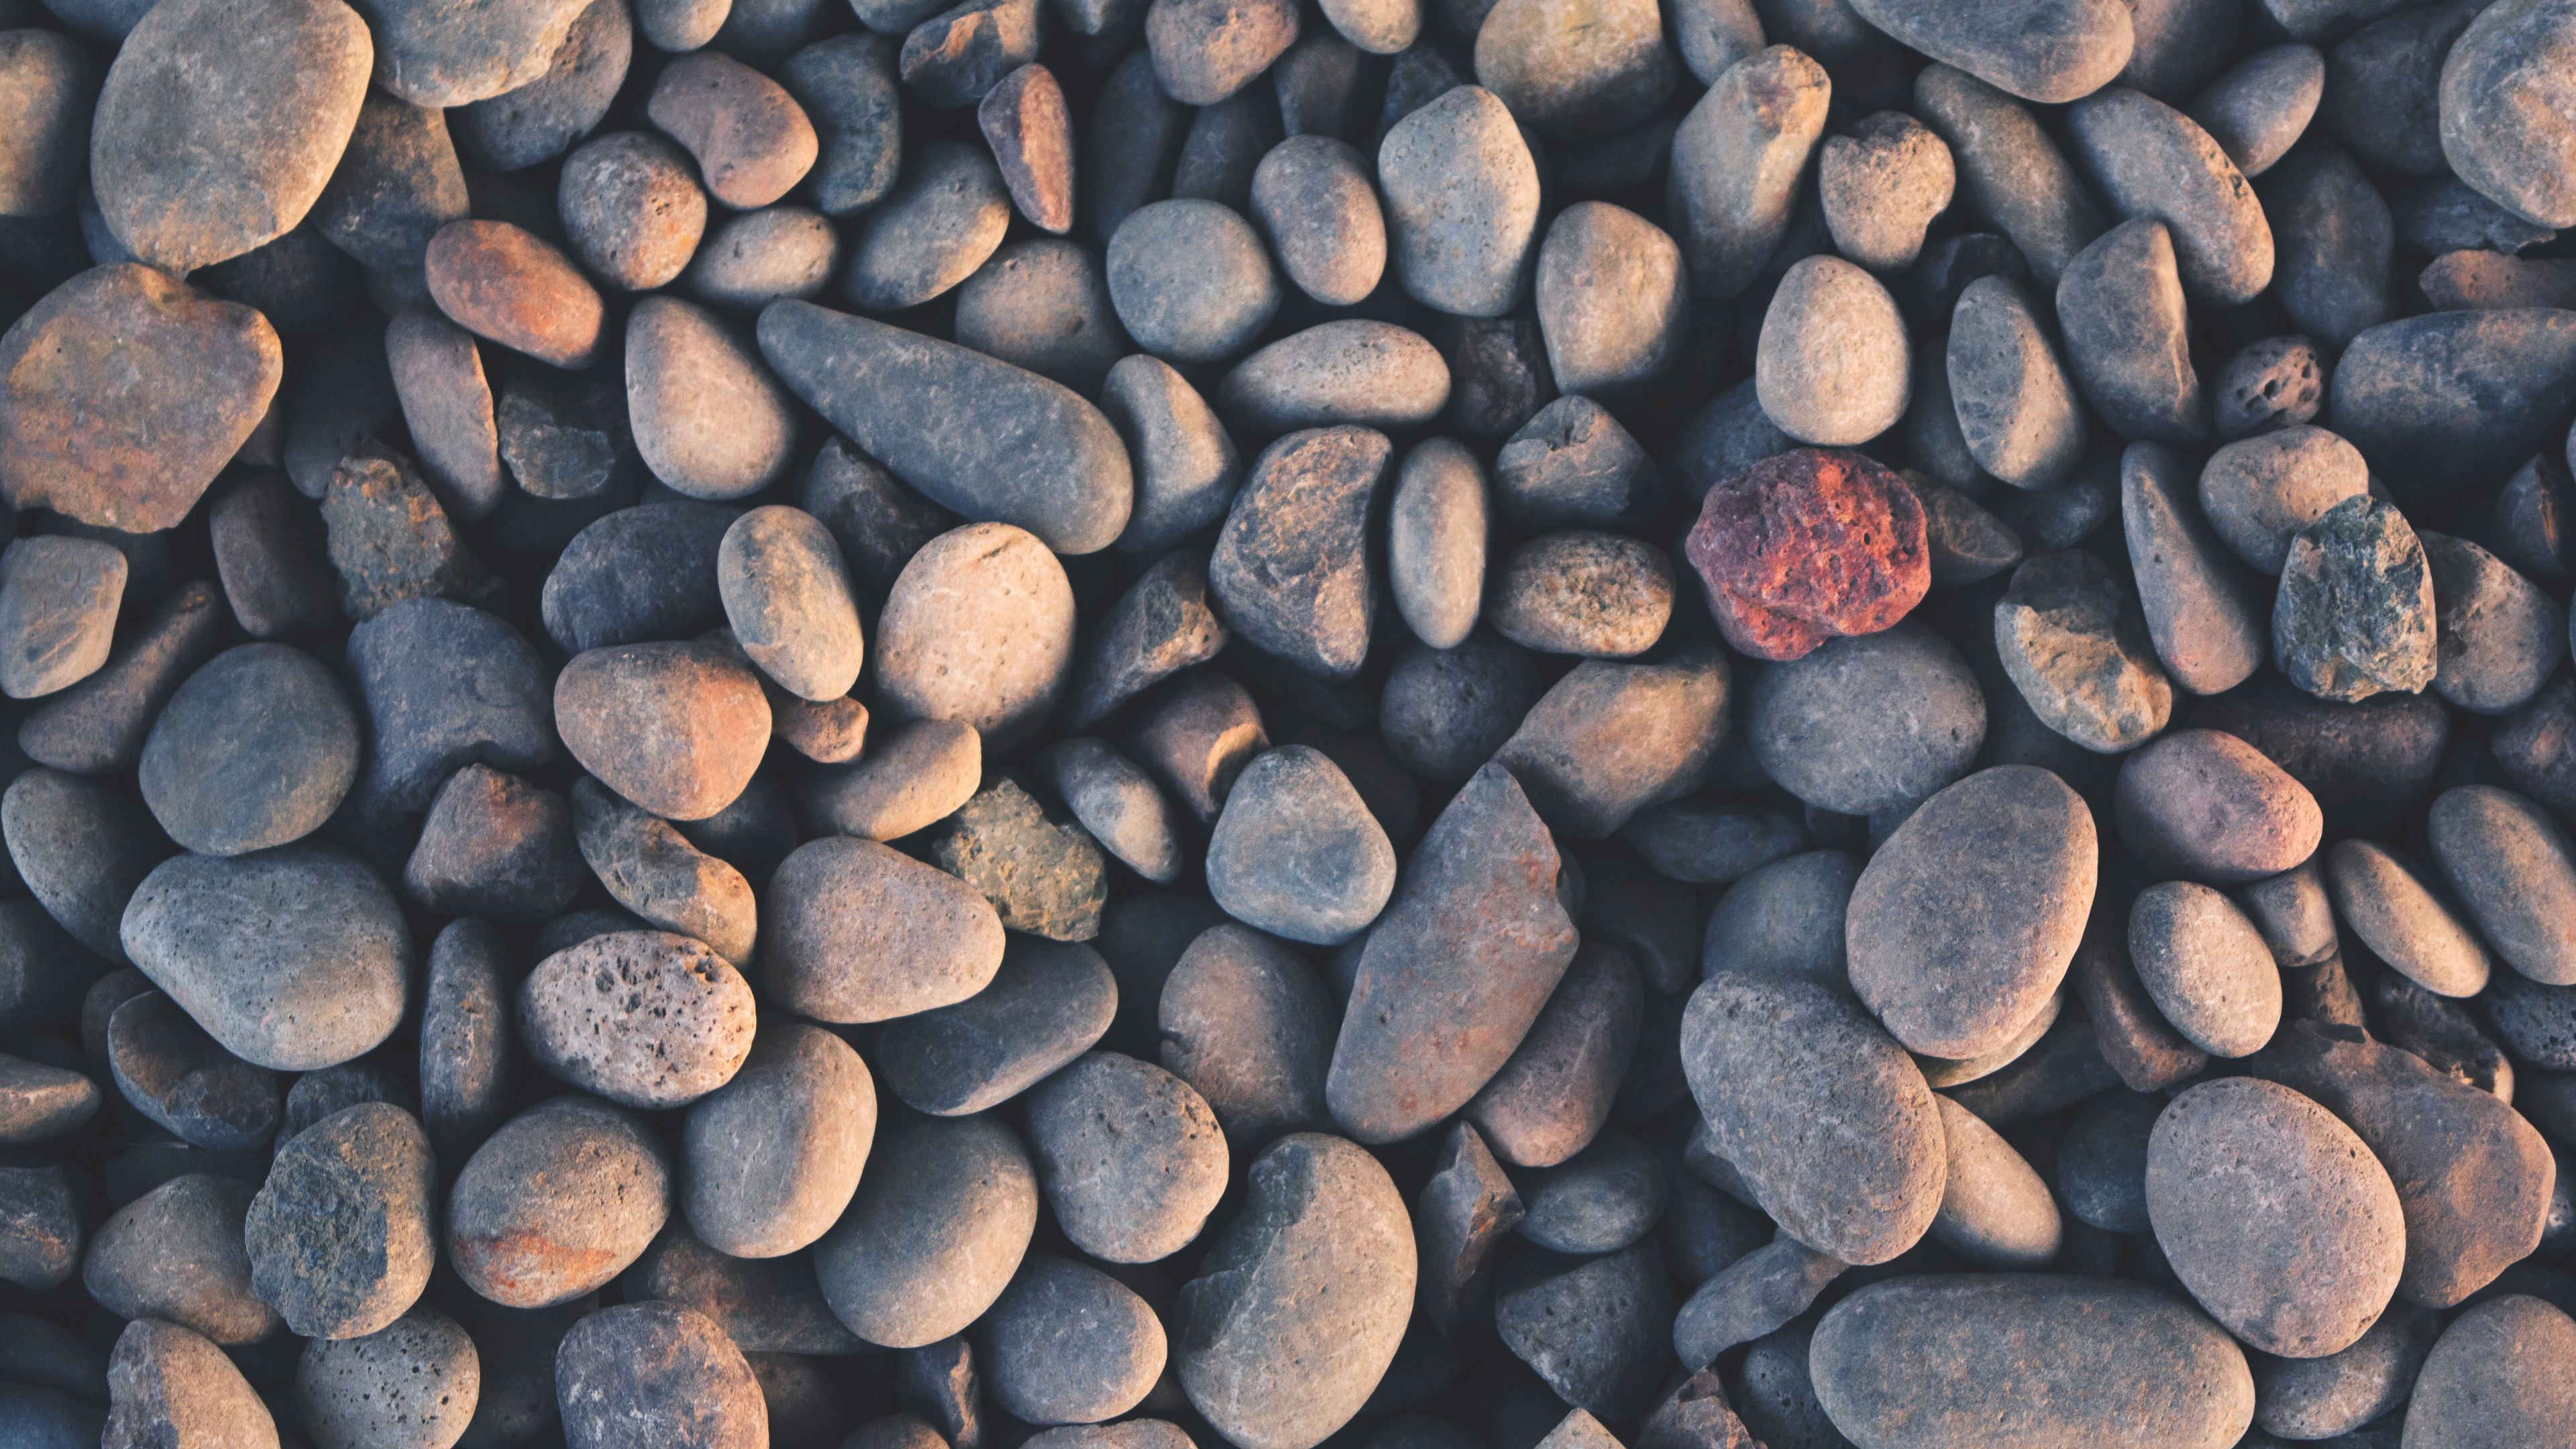 stones background 4k 1540140539 - Stones Background 4k - stones wallpapers, rocks wallpapers, pebble wallpapers, nature wallpapers, hd-wallpapers, 5k wallpapers, 4k-wallpapers